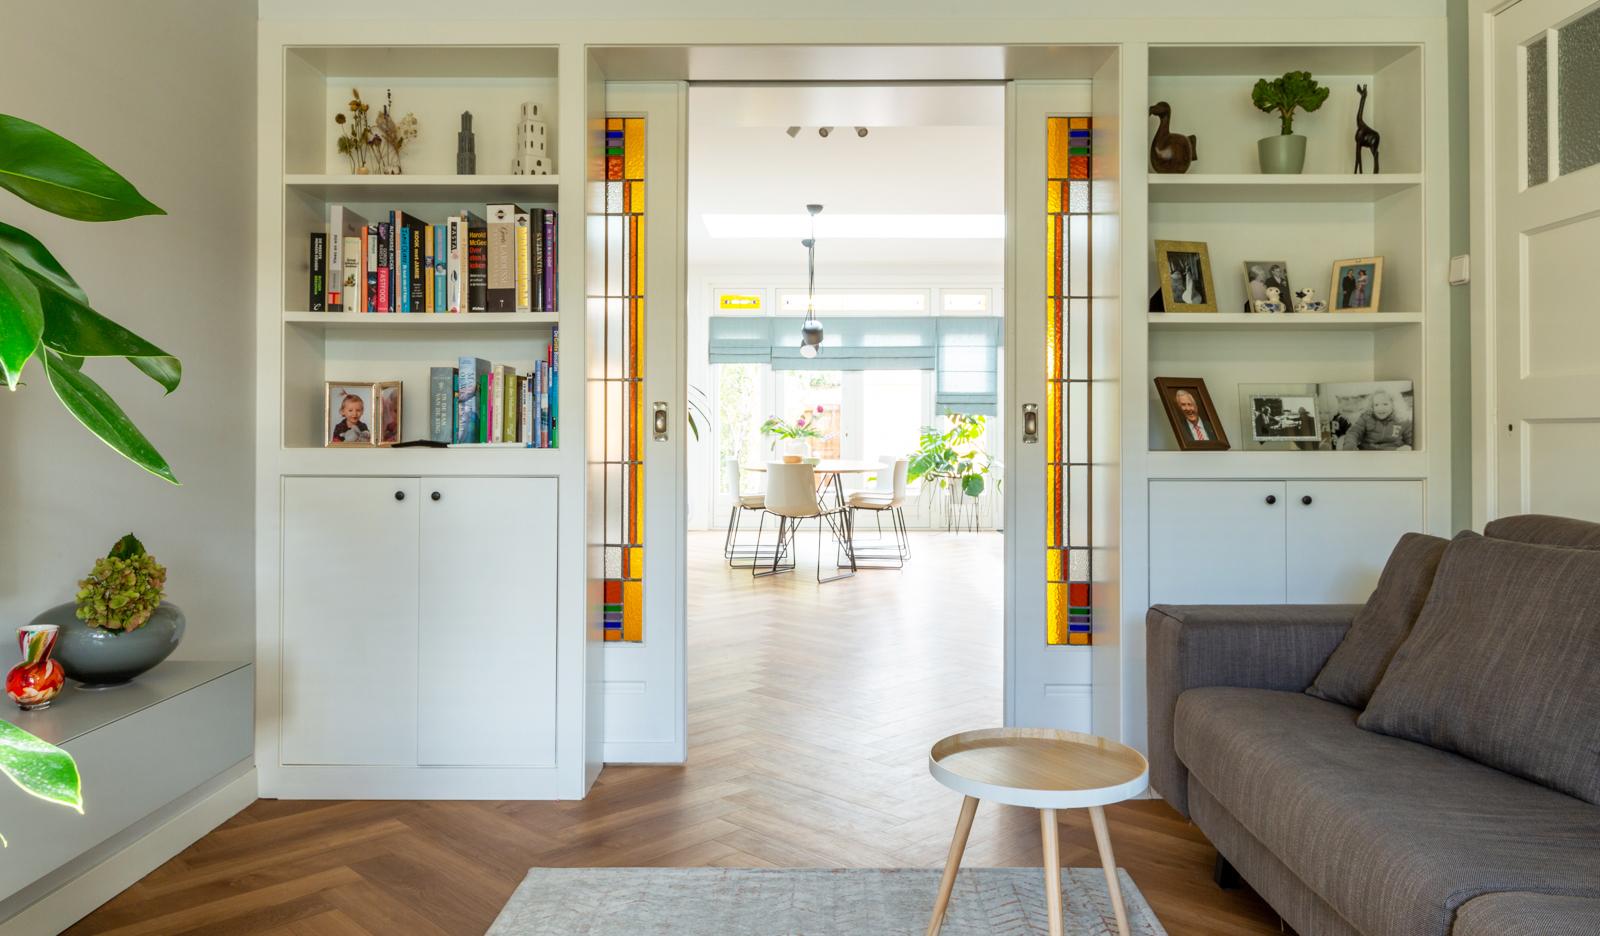 interieurstylist-interieurstyling-interieuradvies-binnenhuisinterieur-utrecht-interieurinspiratie-kleurinspiratie-verbouwen